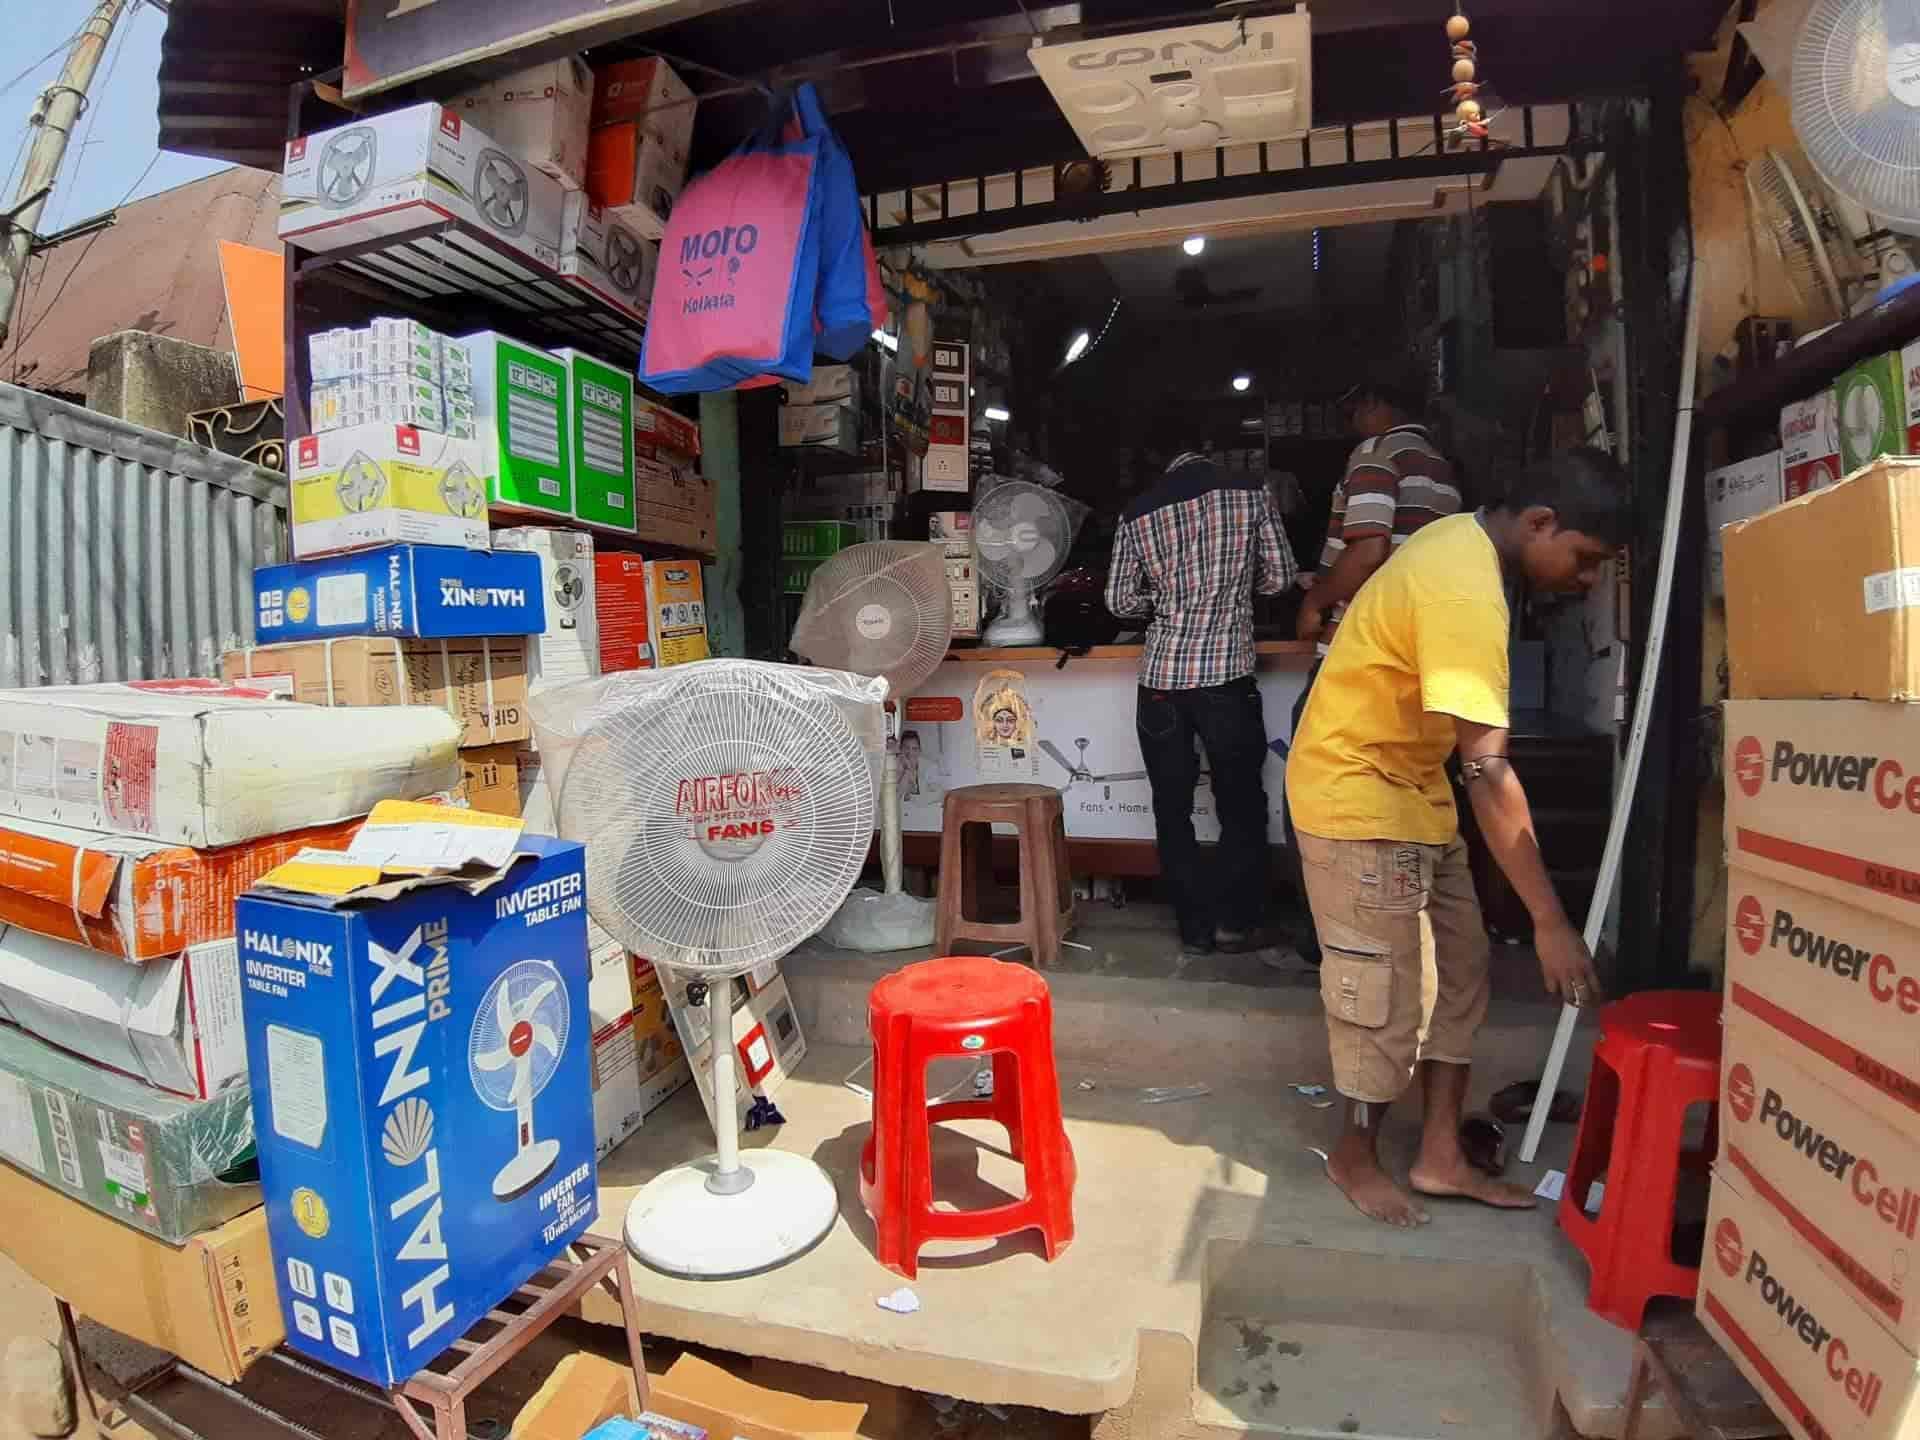 Royal Electric, Near Hunuman Ji Tample - Electrical Shops in